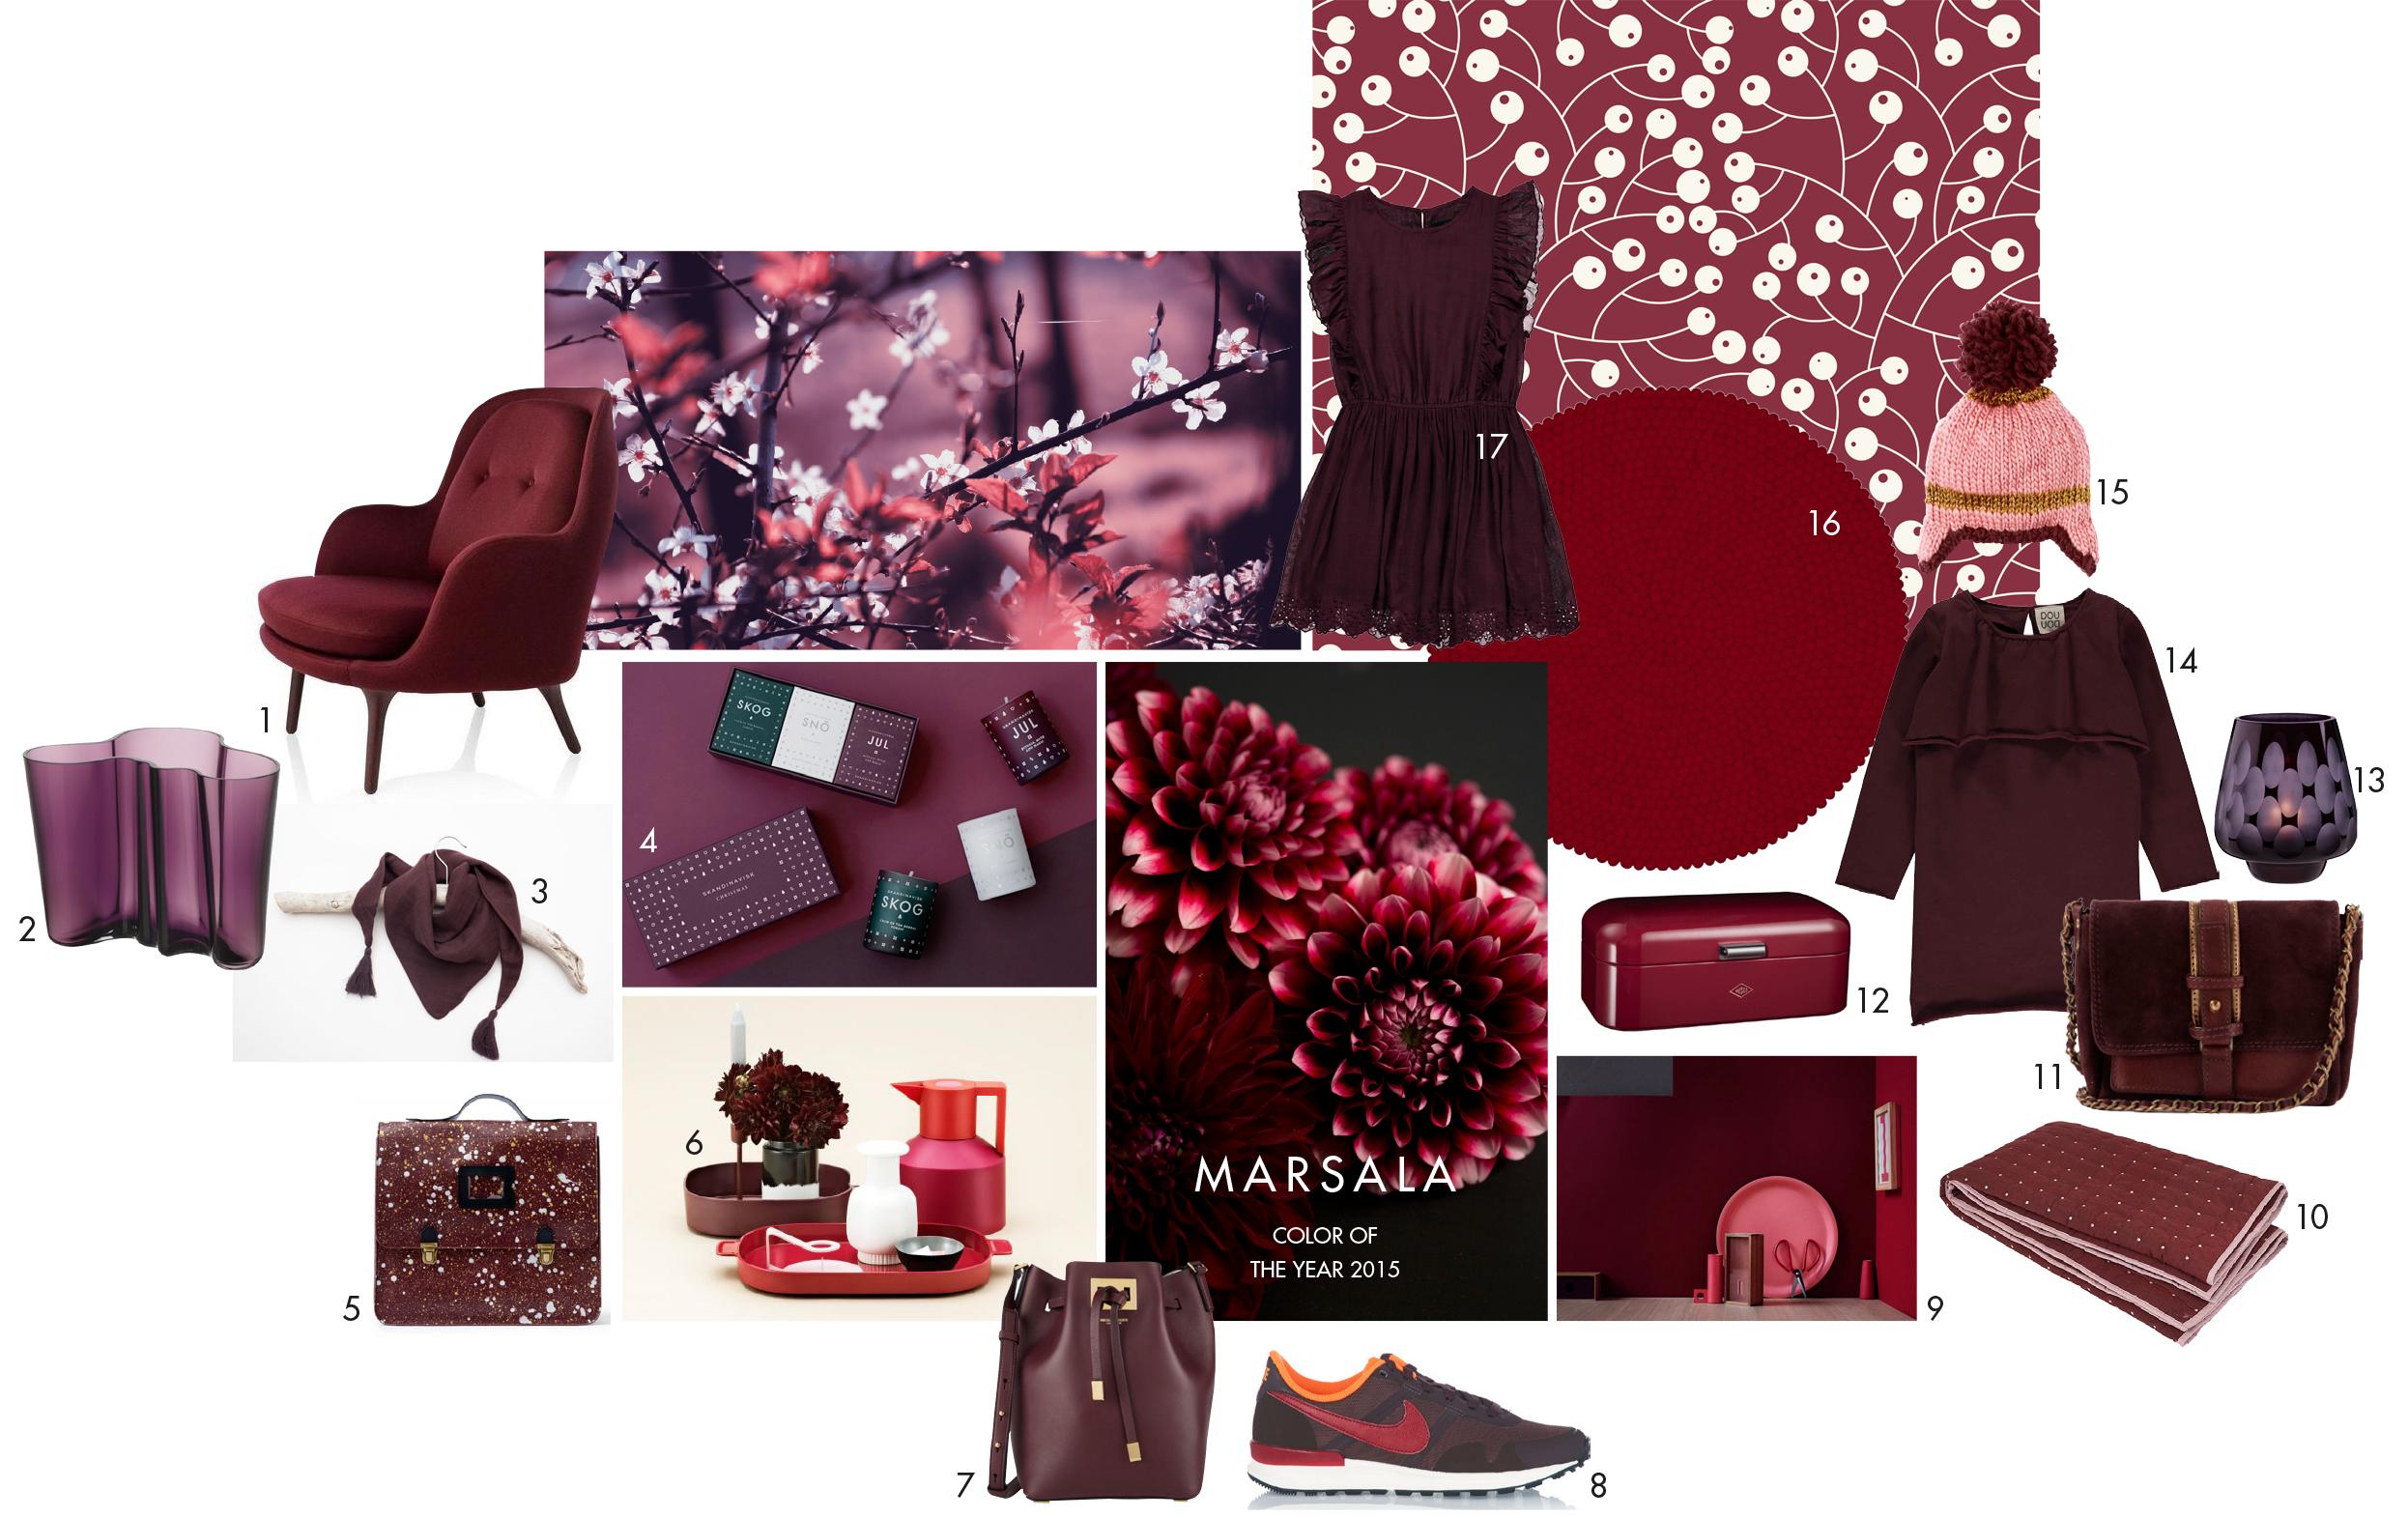 glamour ser auftritt der trendfarbe marsala. Black Bedroom Furniture Sets. Home Design Ideas